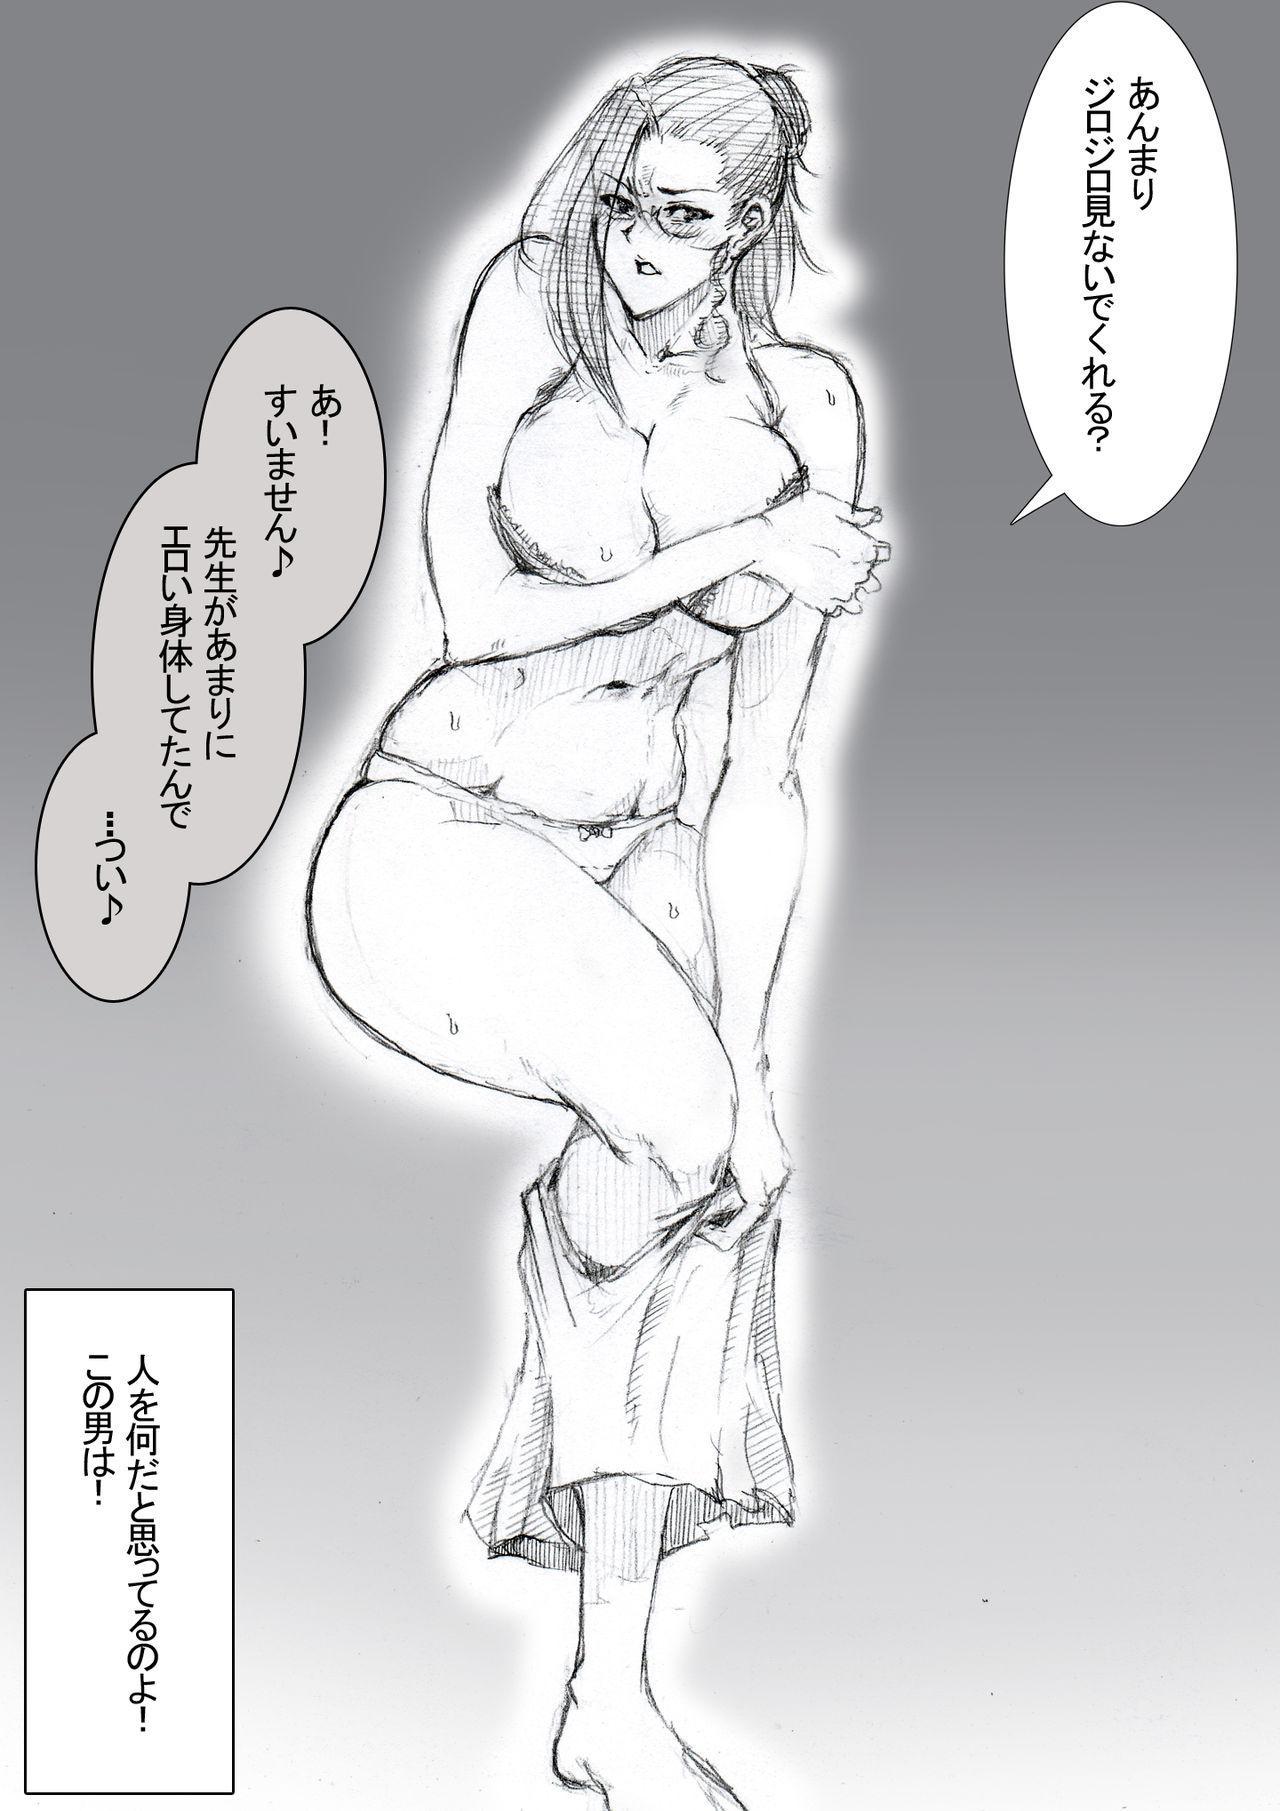 市ノ瀬美加子の場合 35